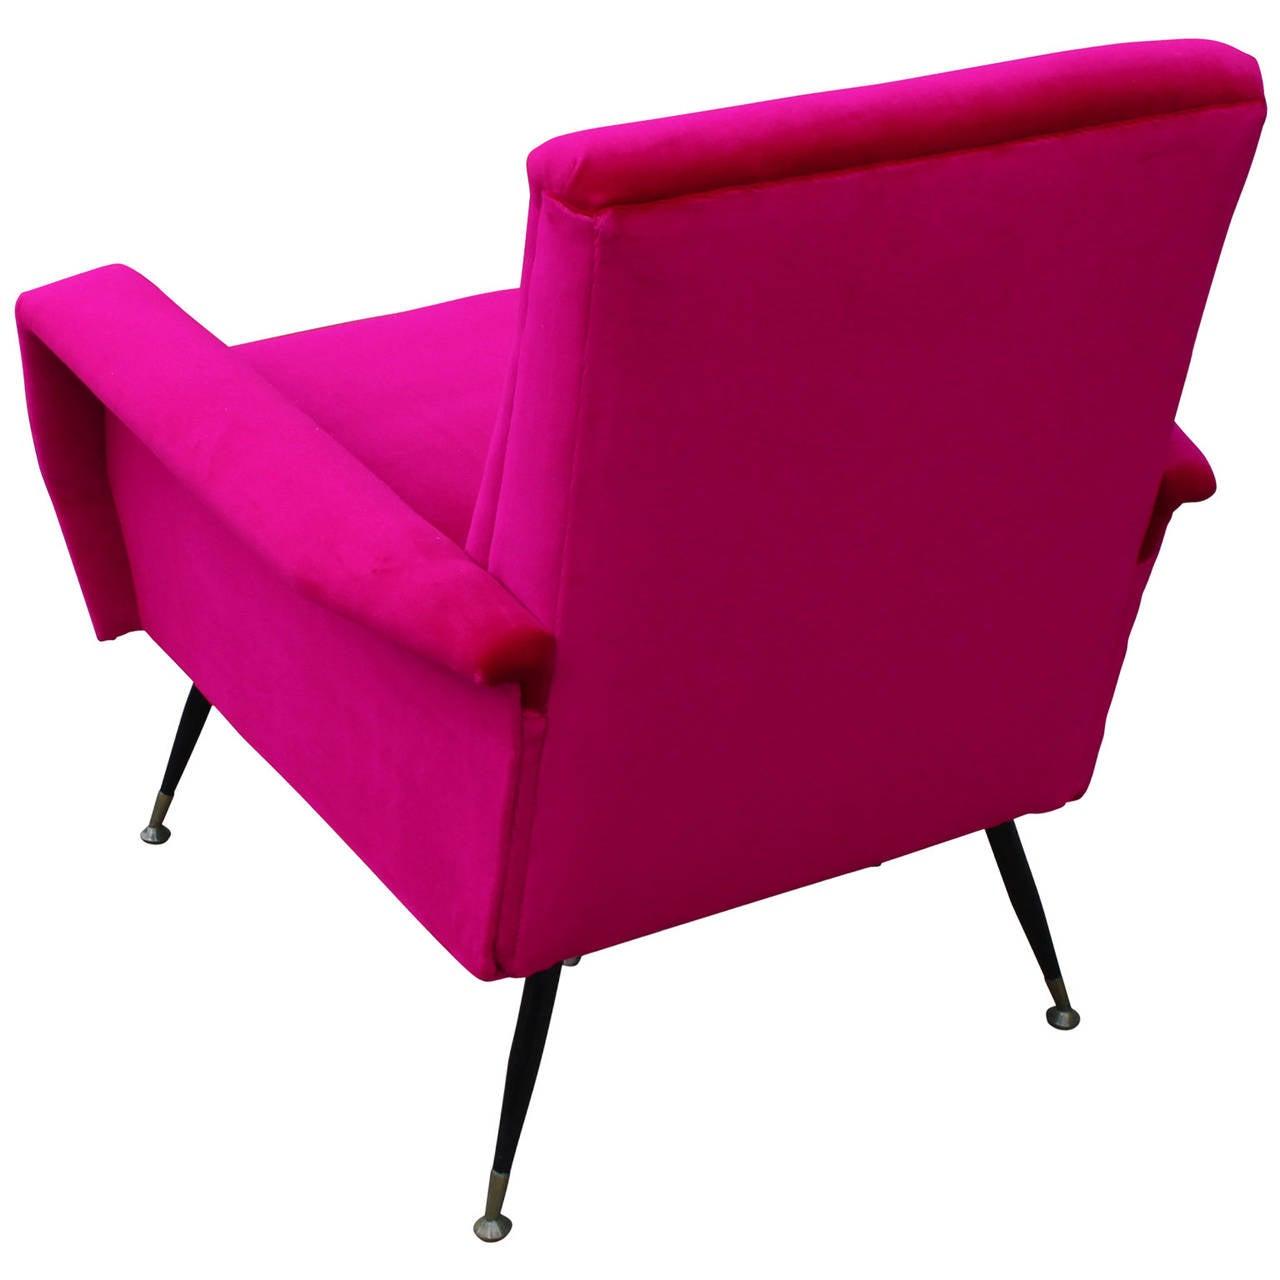 Incredible Bold Pink Velvet Italian Lounge Chair at 1stdibs